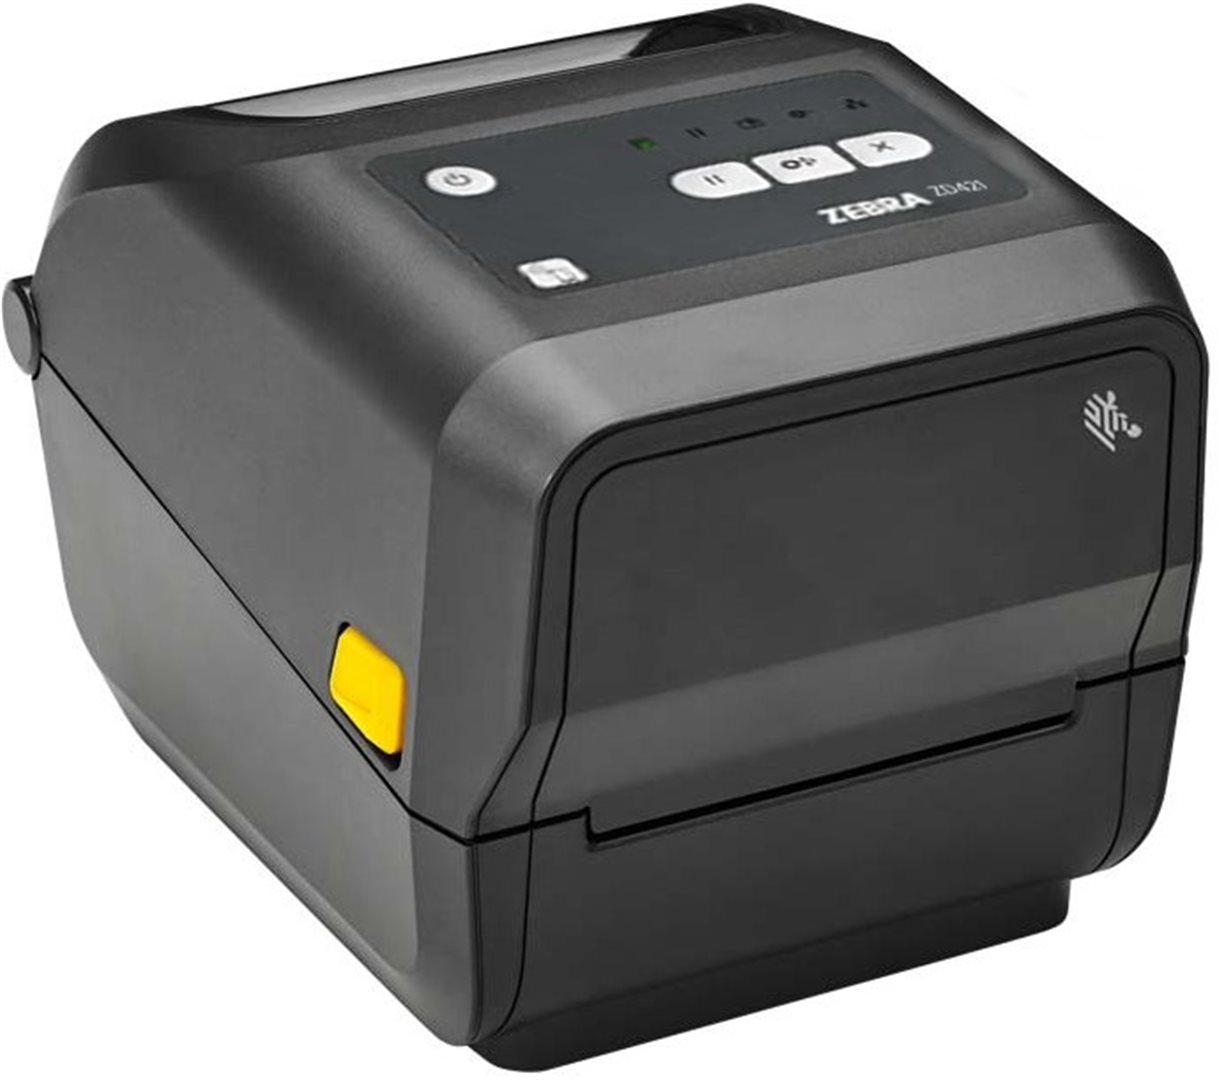 ZD421d - DT, 300 dpi, USB, Wi-Fi, BT